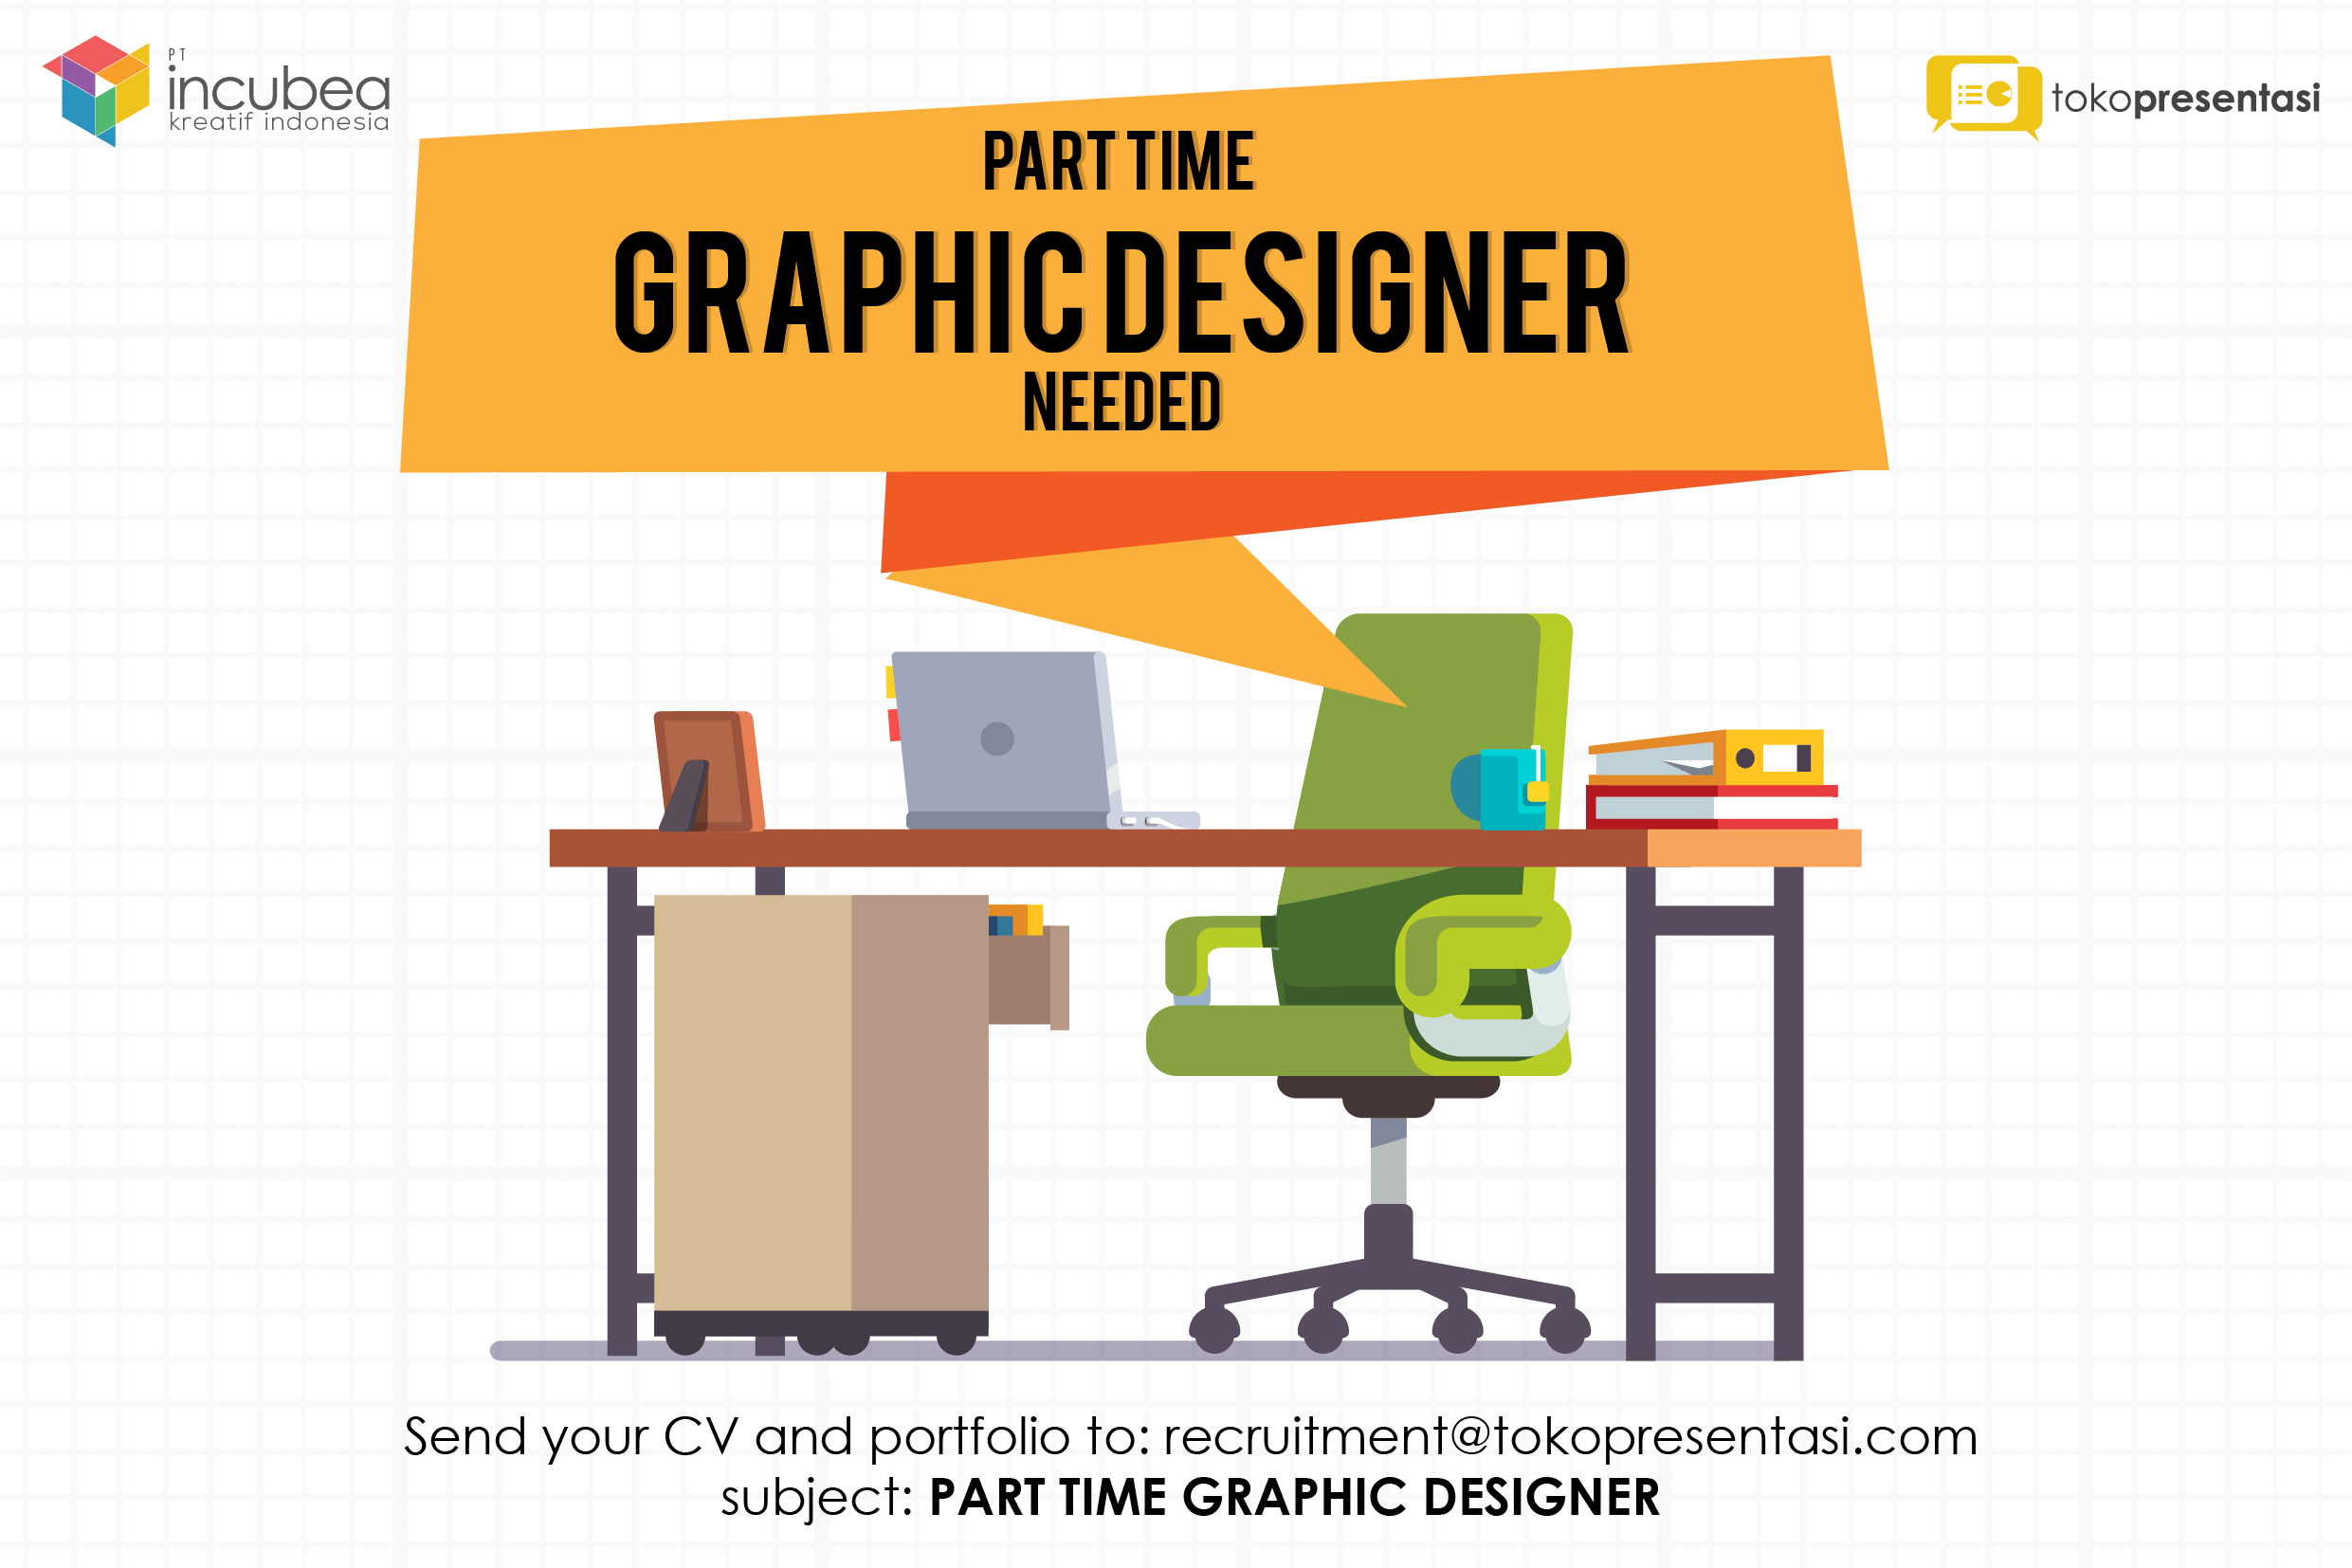 lowongan kerja desain grafis part time tokopresentasi